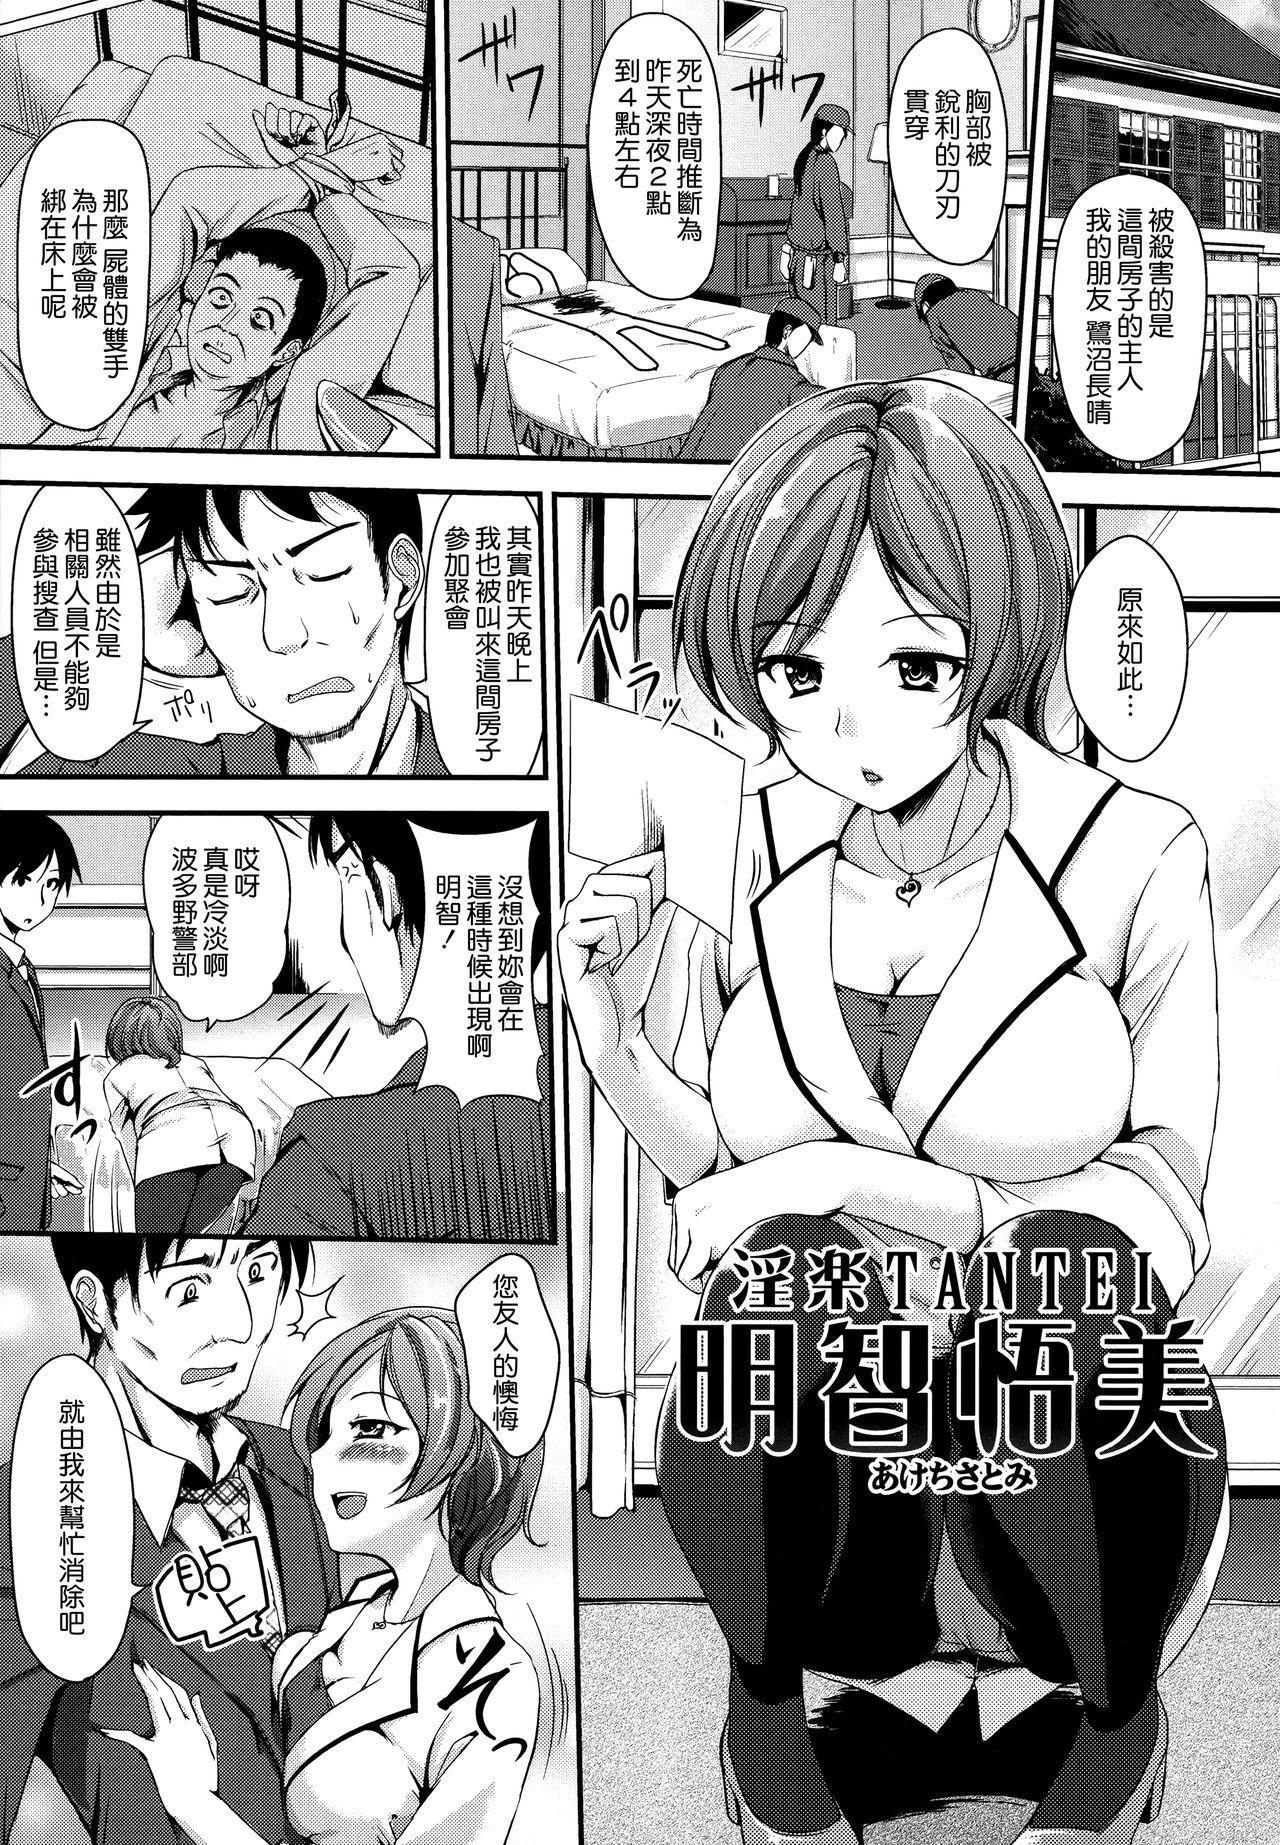 Kimagure Hanabira + Toranoana Leaflet 103